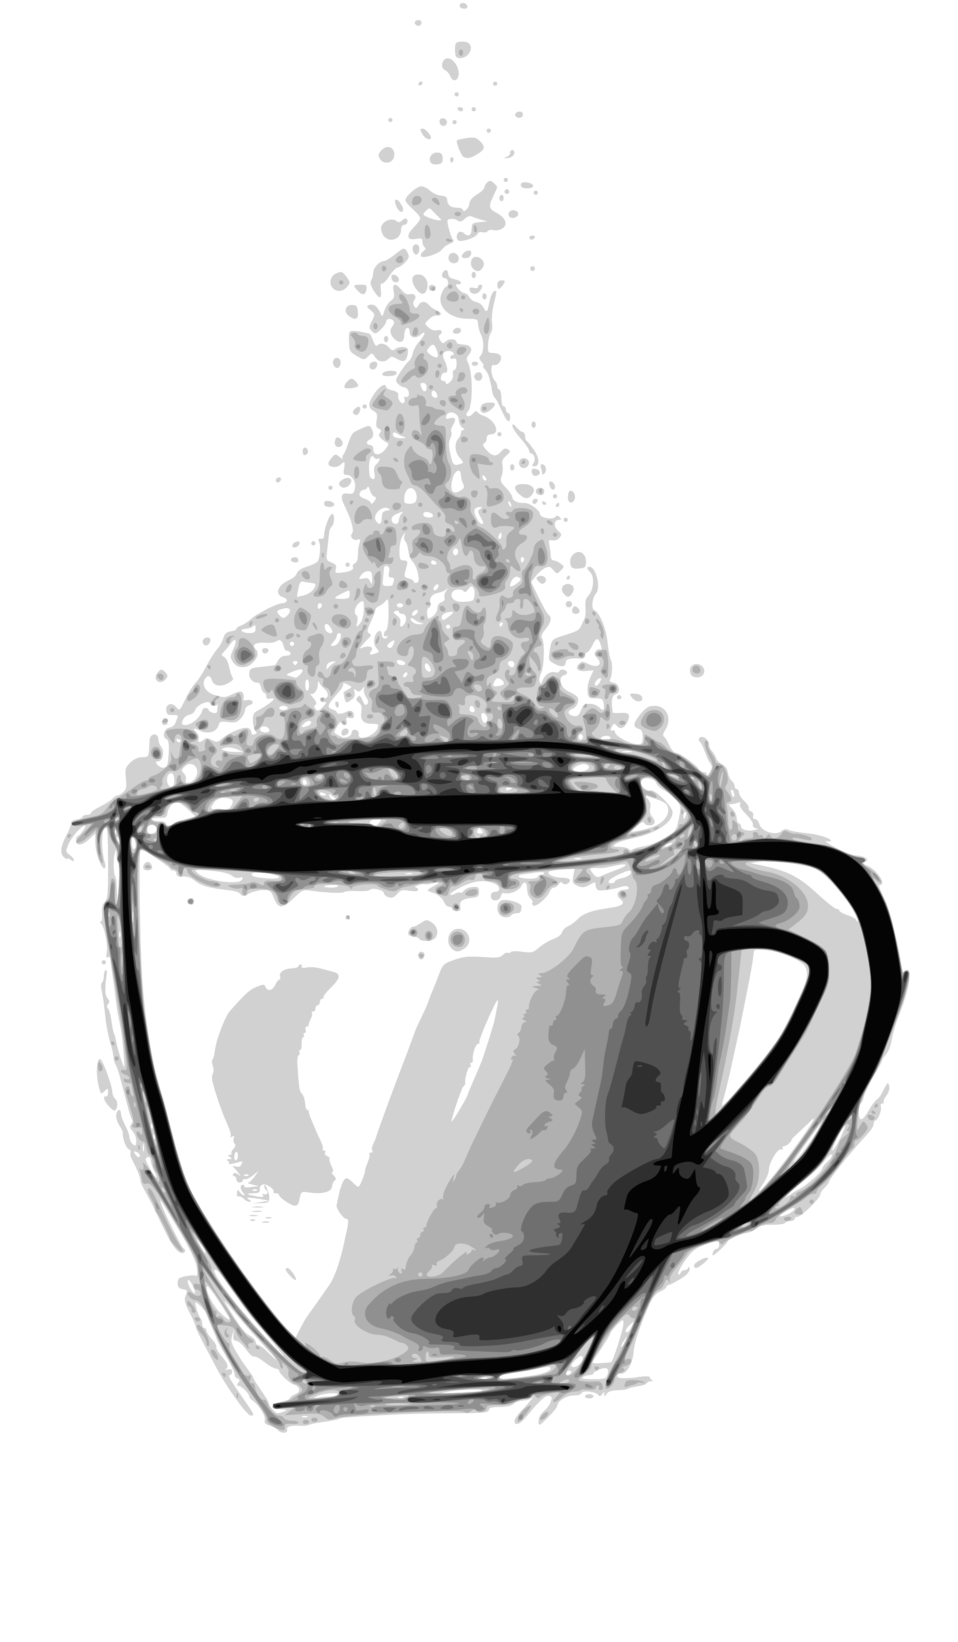 Sketchy Coffee